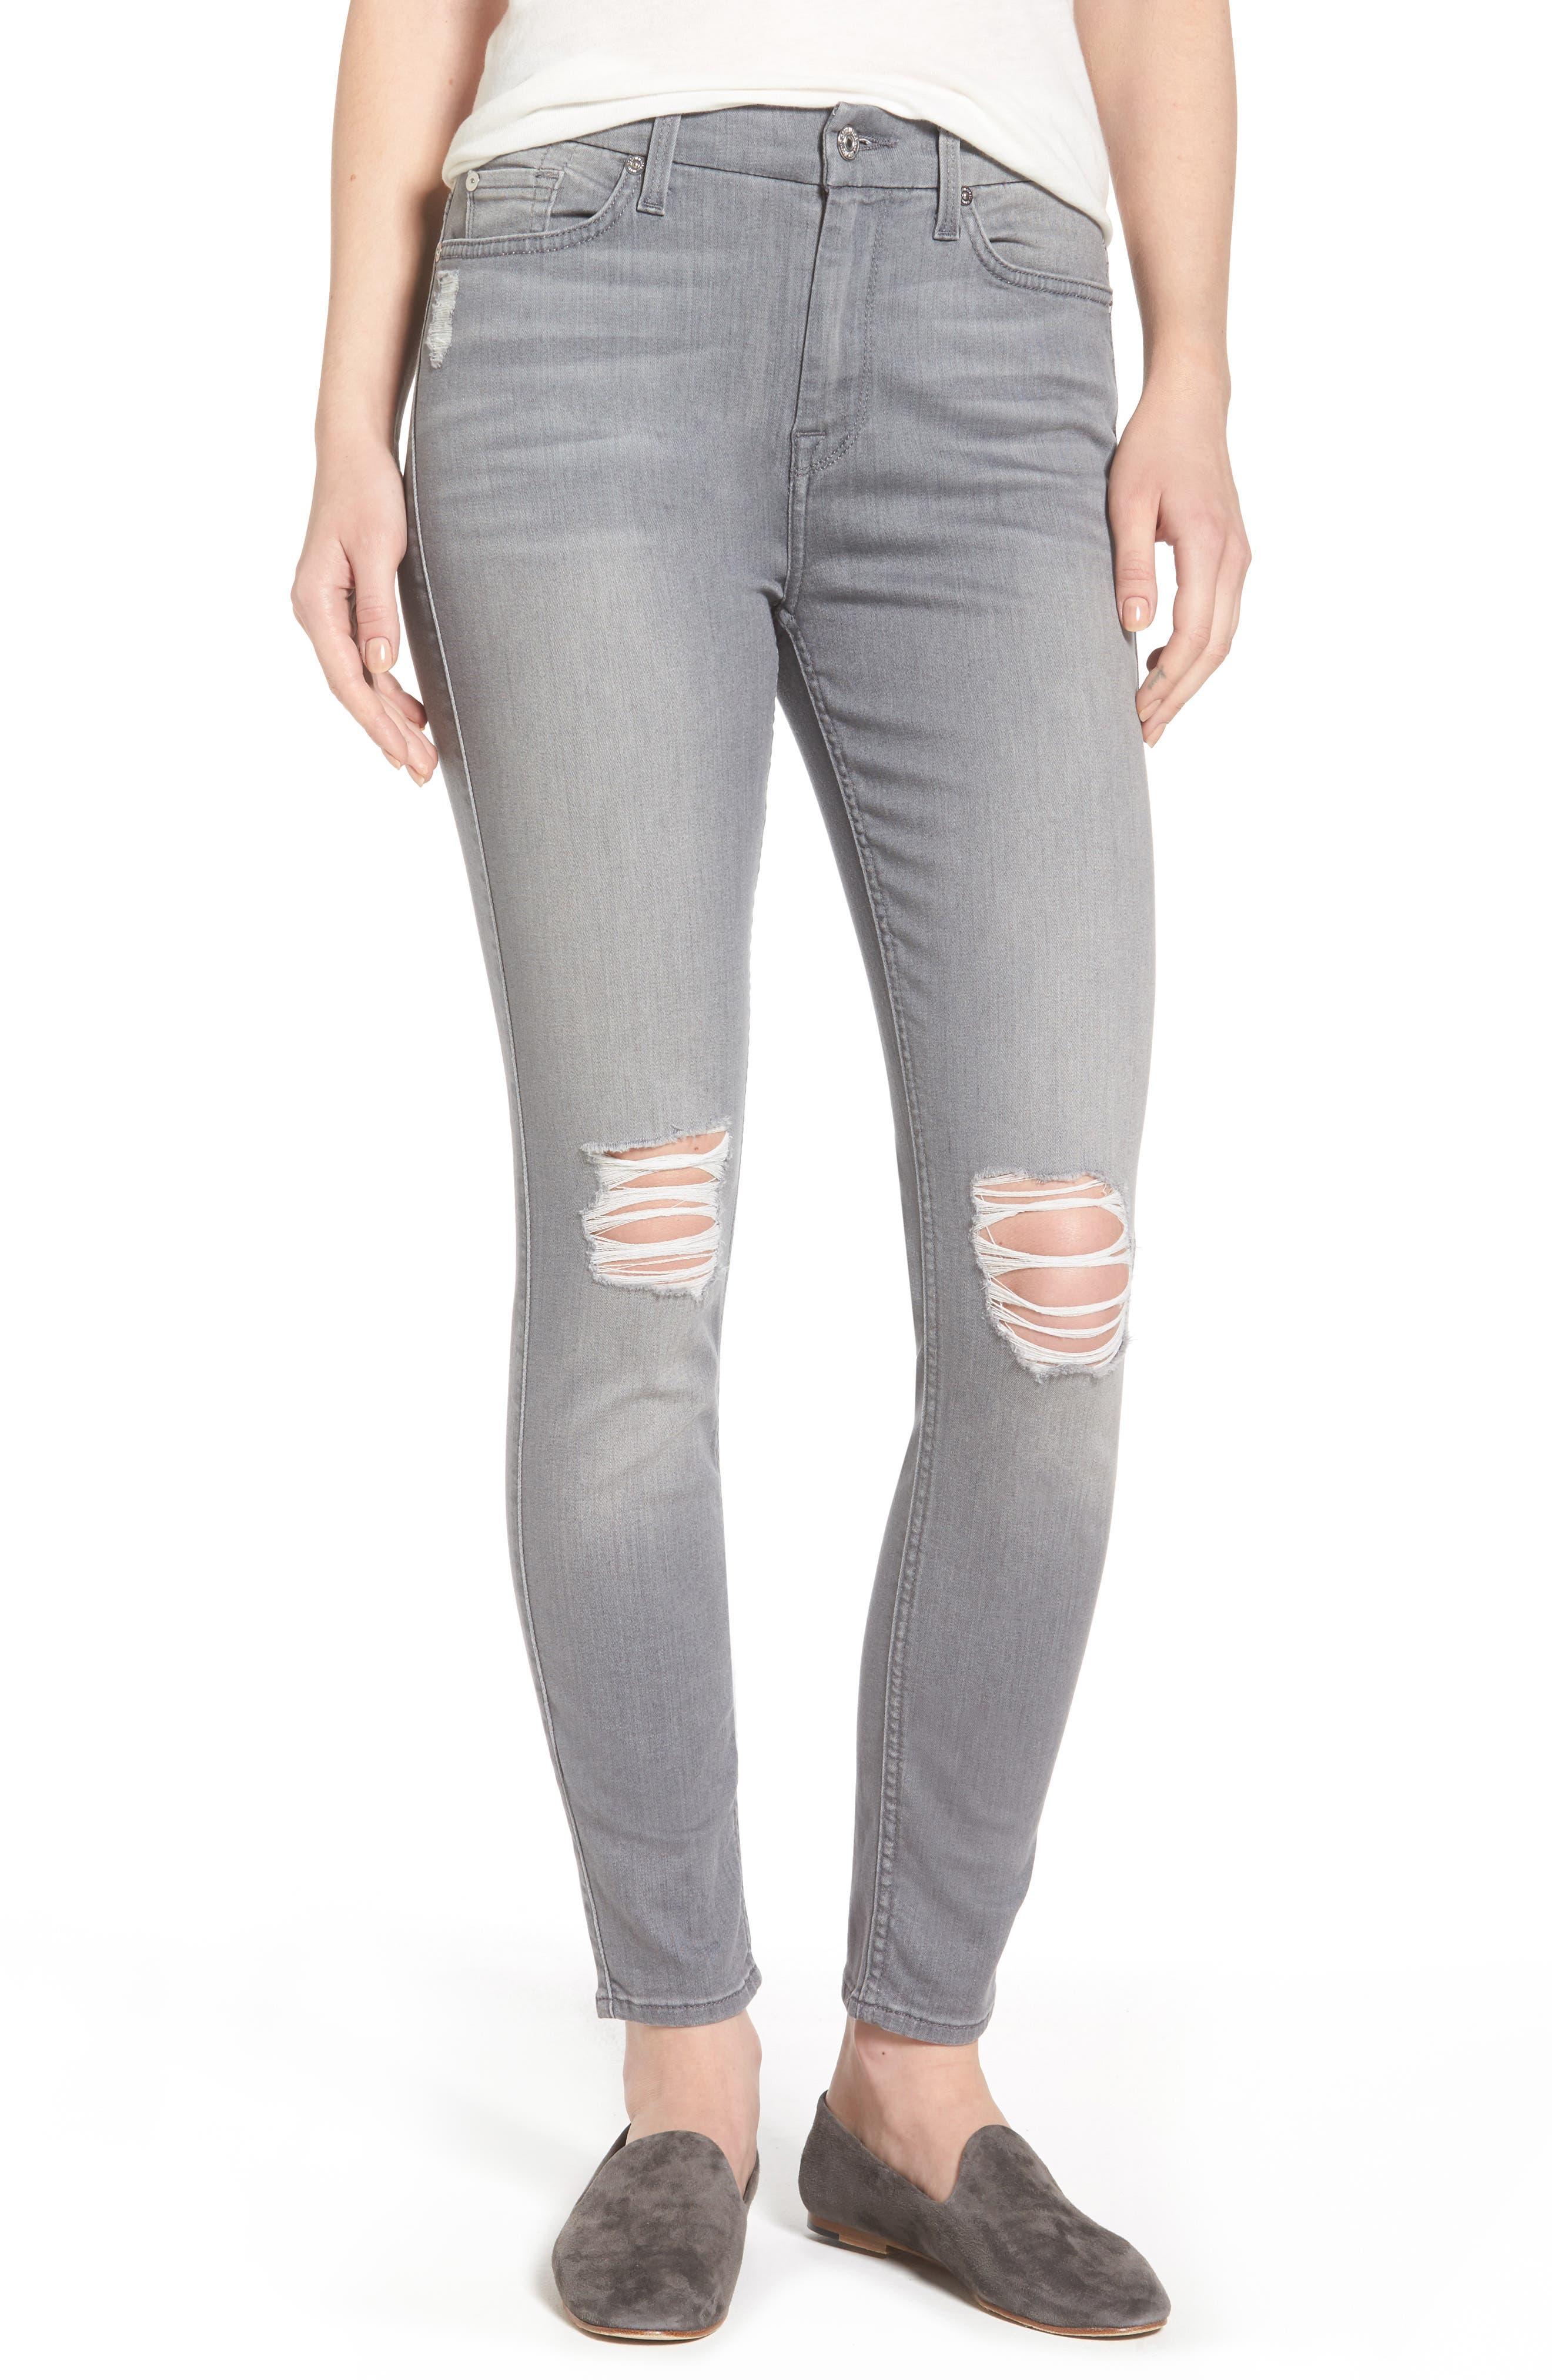 b(air) High Waist Skinny Jeans,                         Main,                         color, B(Air) Chrysler Grey- Bac2